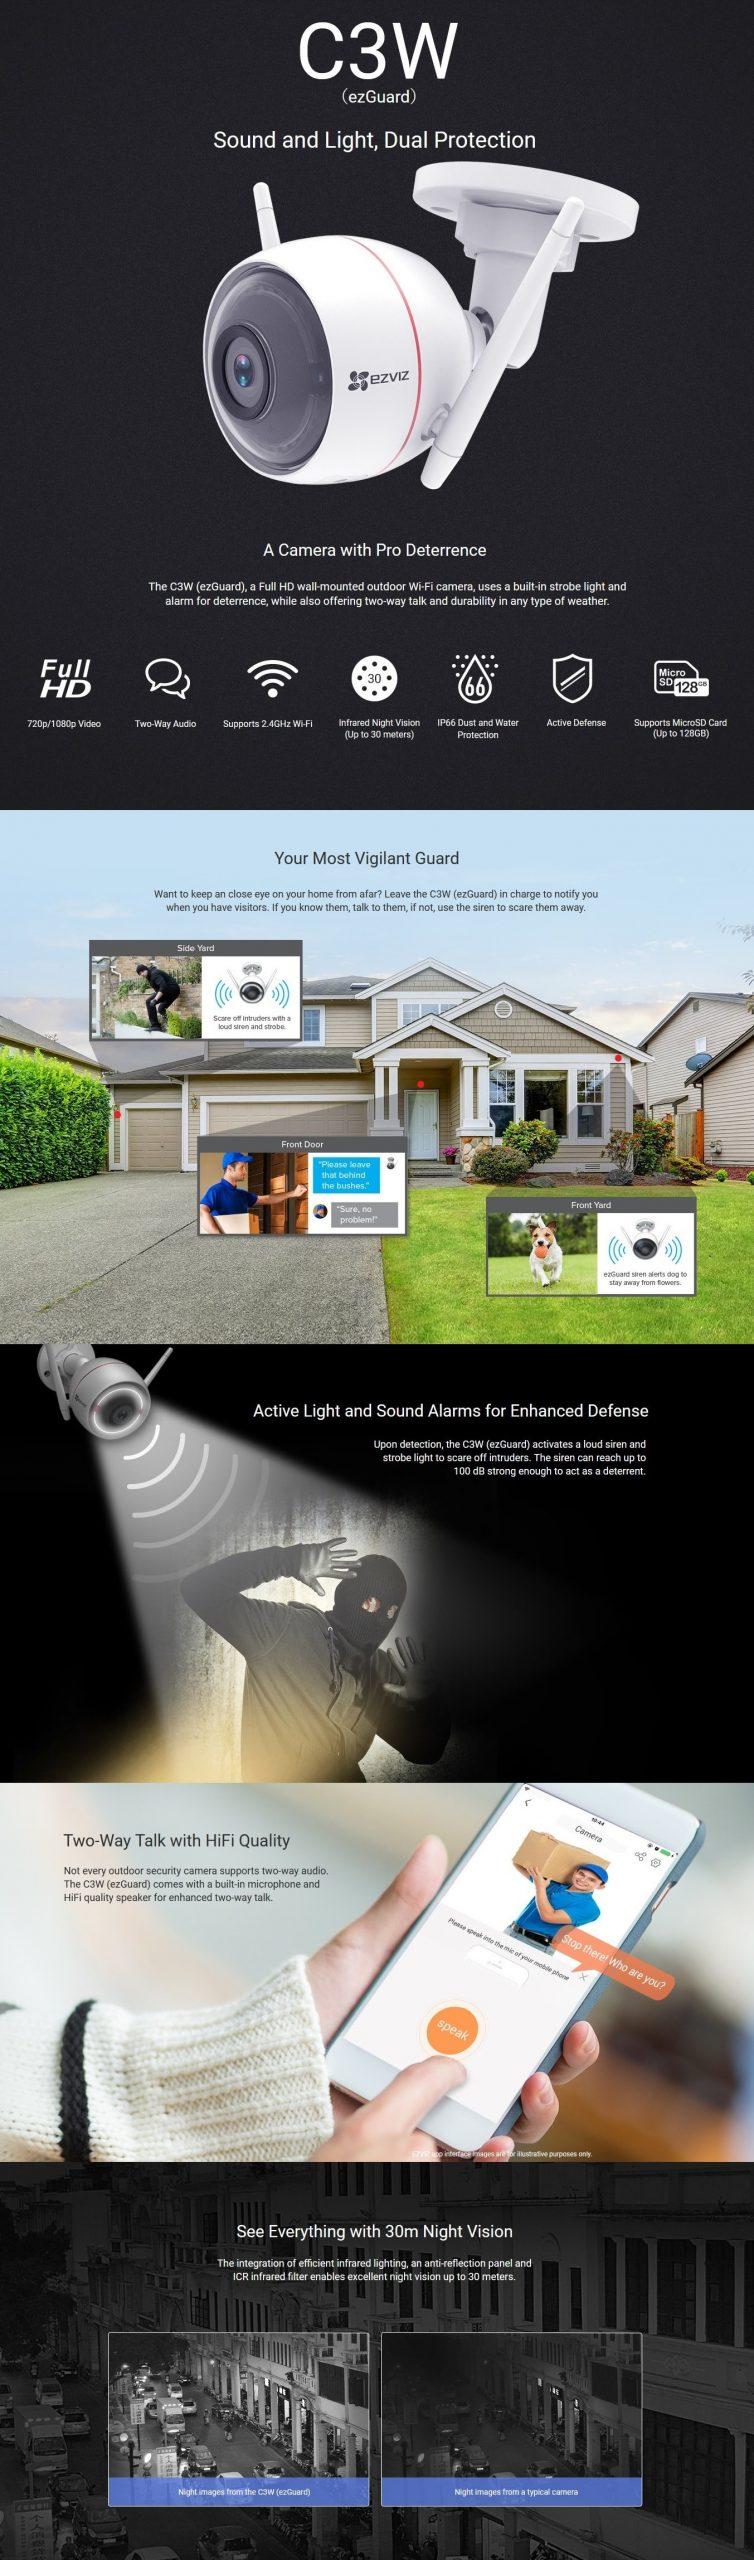 EZVIZ Outdoor Smart Wi-Fi Camera (CS-CV310-A0-1C2WFR)